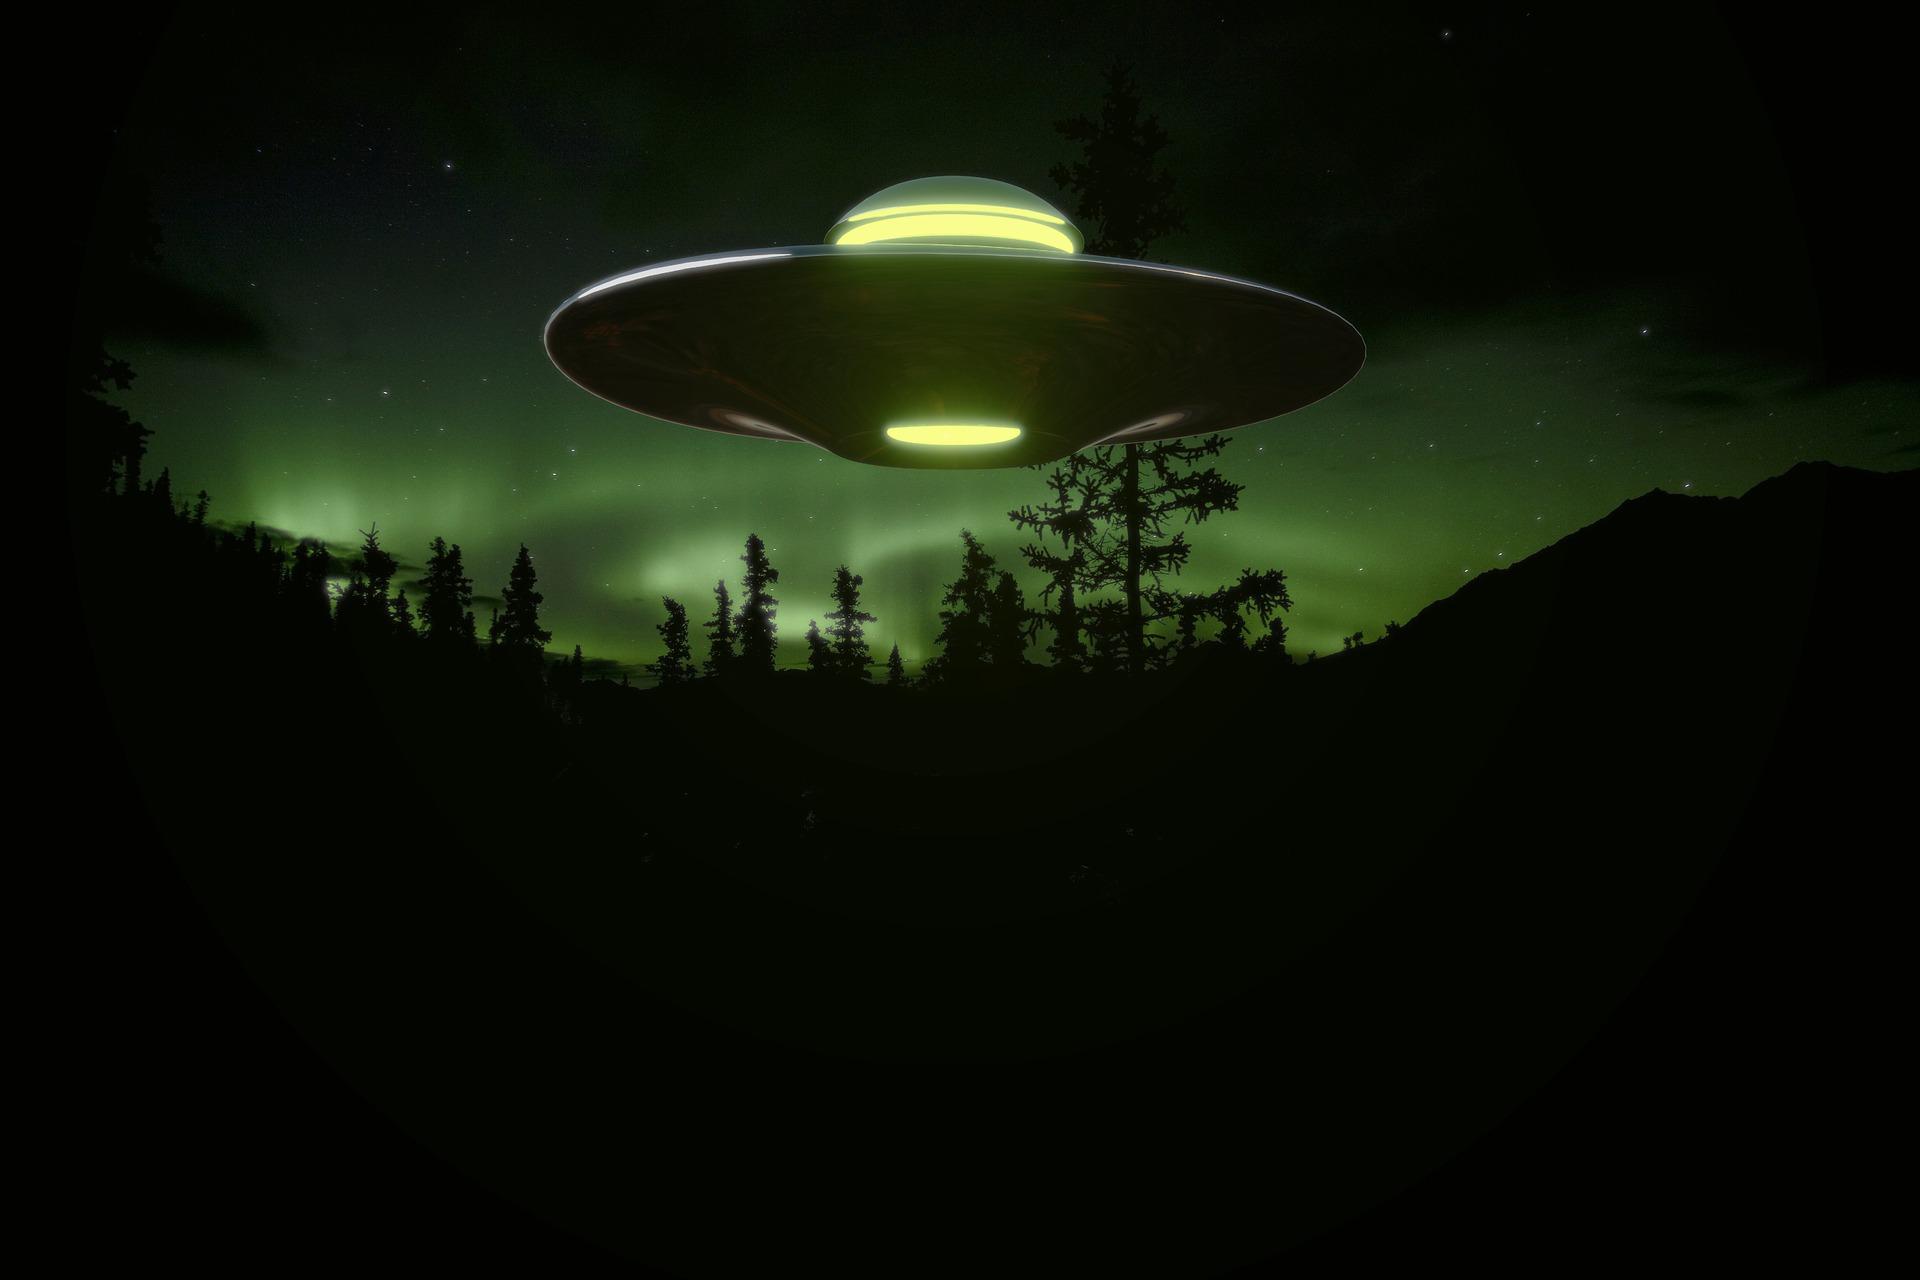 ufo-4199298_1920